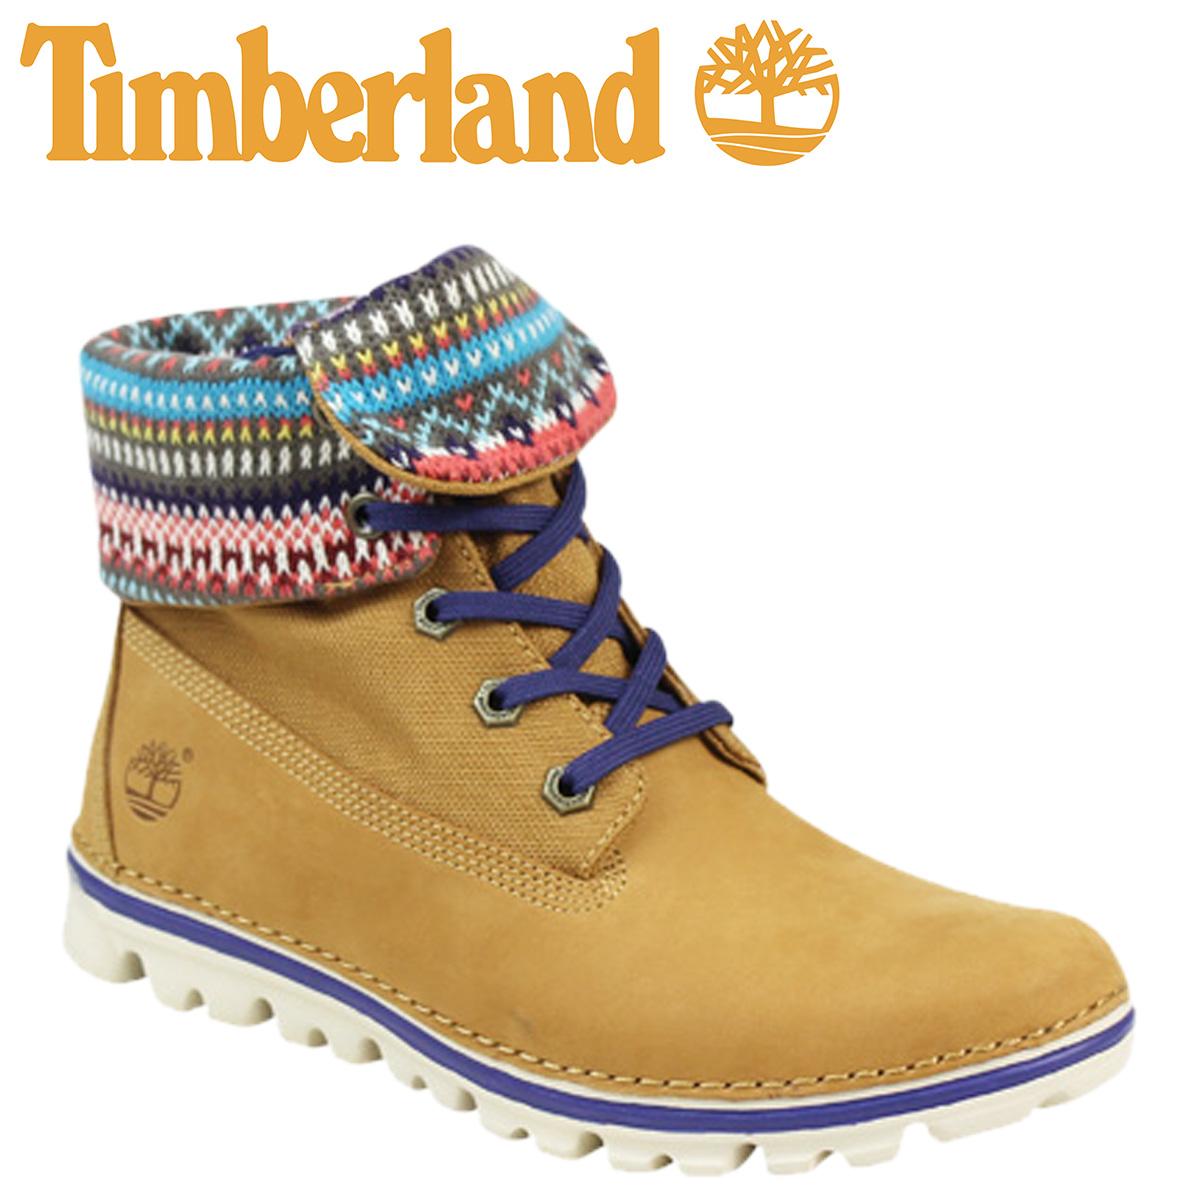 Timberland Timberland women s Earthkeepers Brooke t roll top boots WOMEN S  EK BRKTN RT KNIT W wise nubuck 8350A wheat 077eb1a438